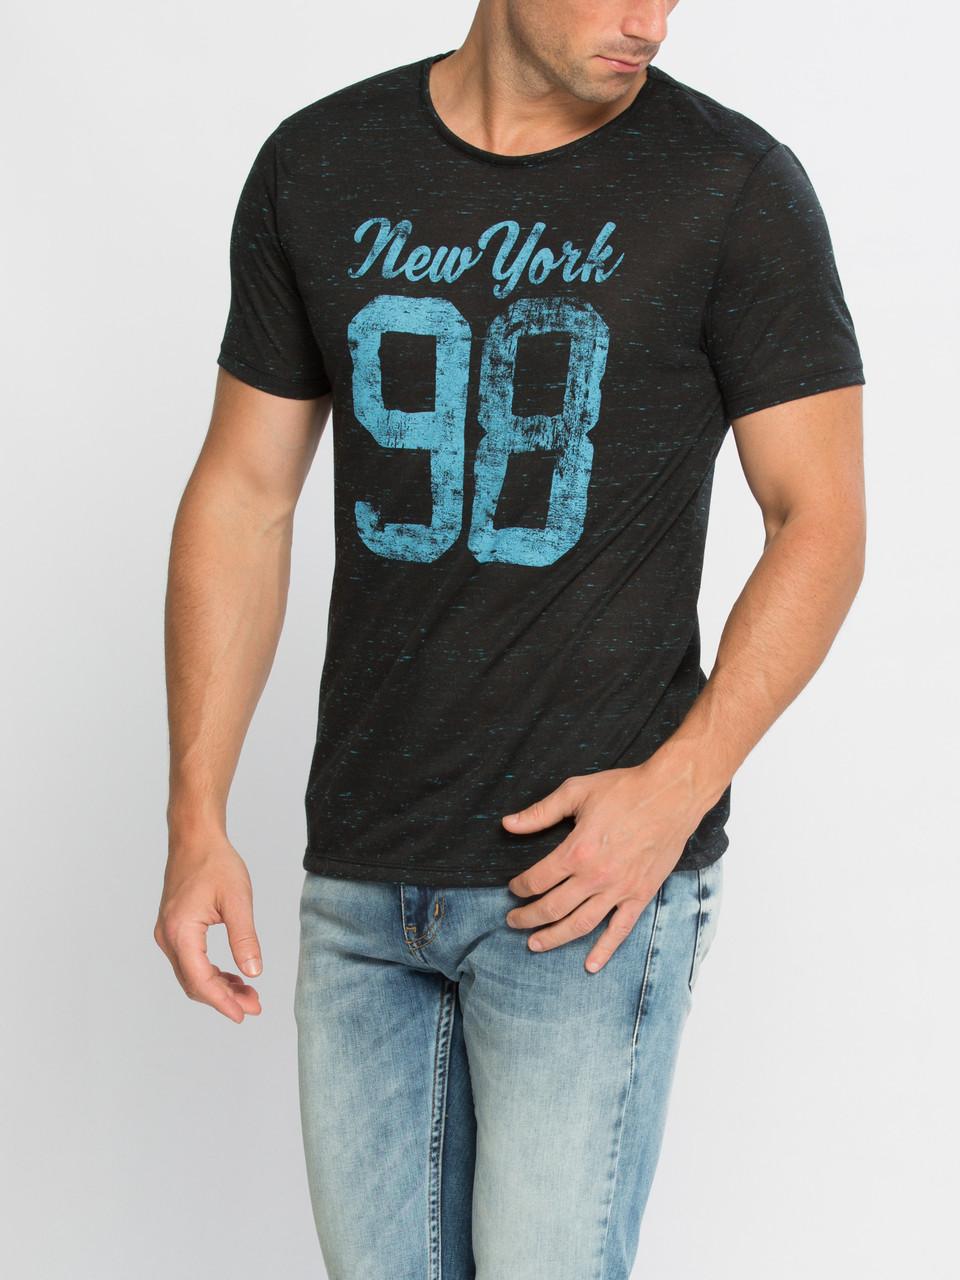 Мужская футболка LC Waikiki черного цвета с надписью New York 98